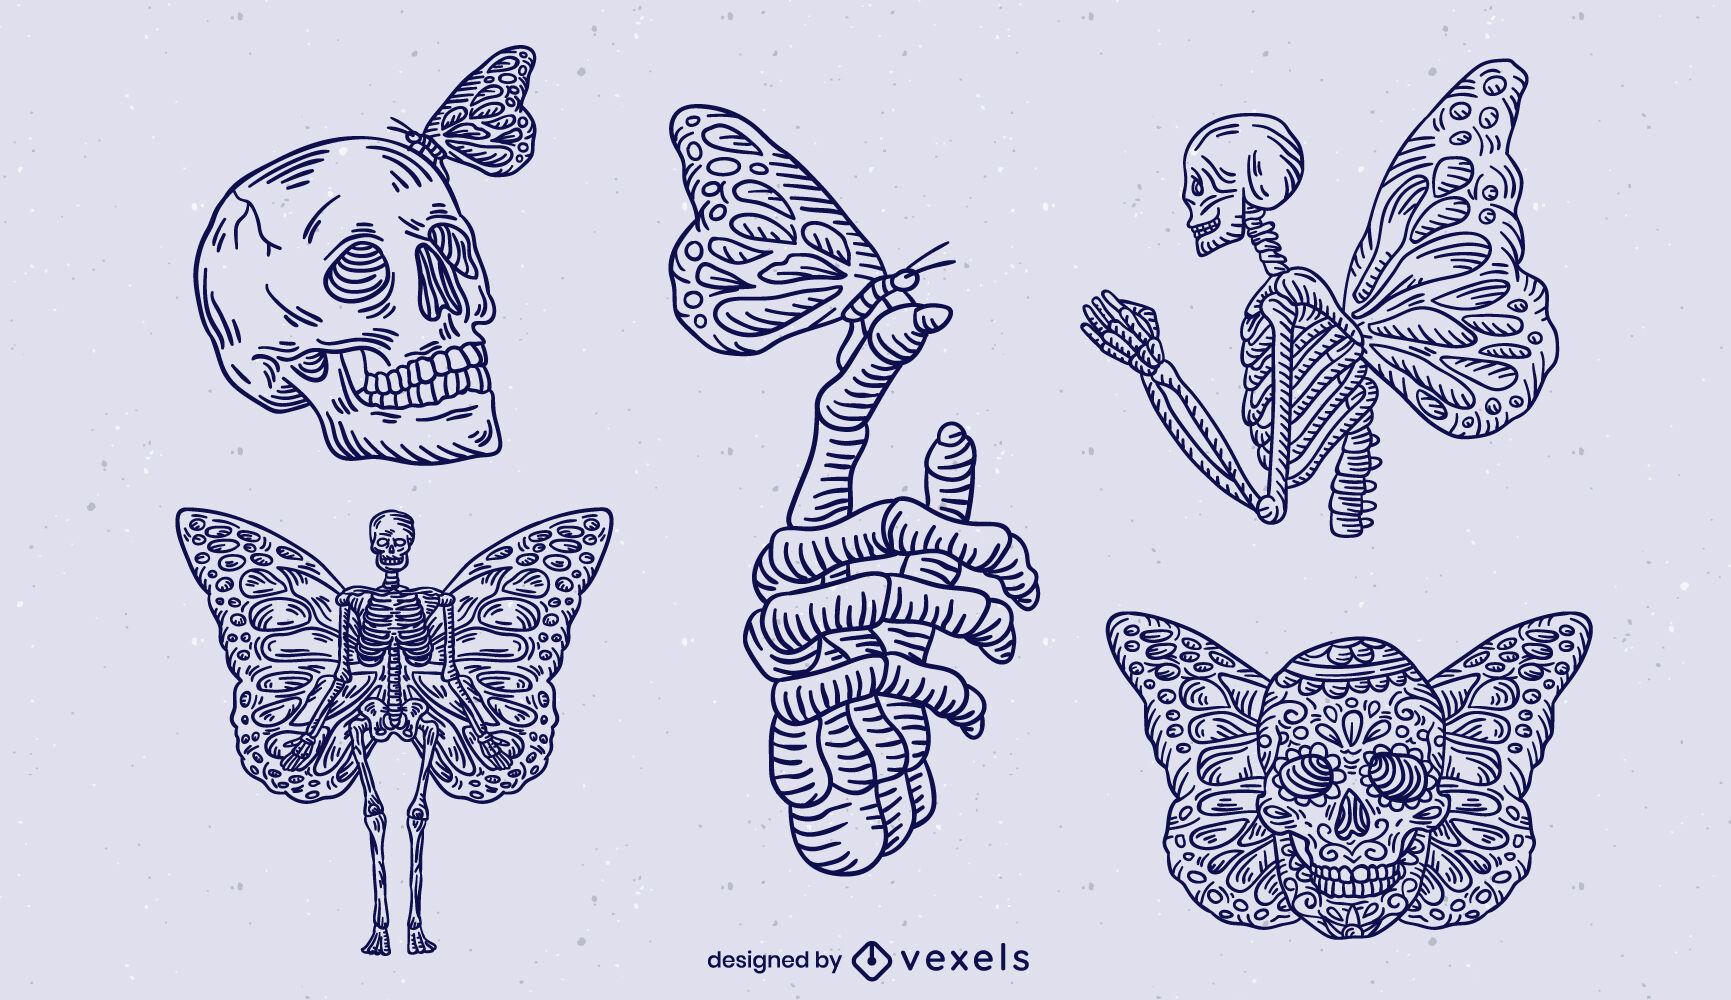 Skeletons and butterflies stroke set